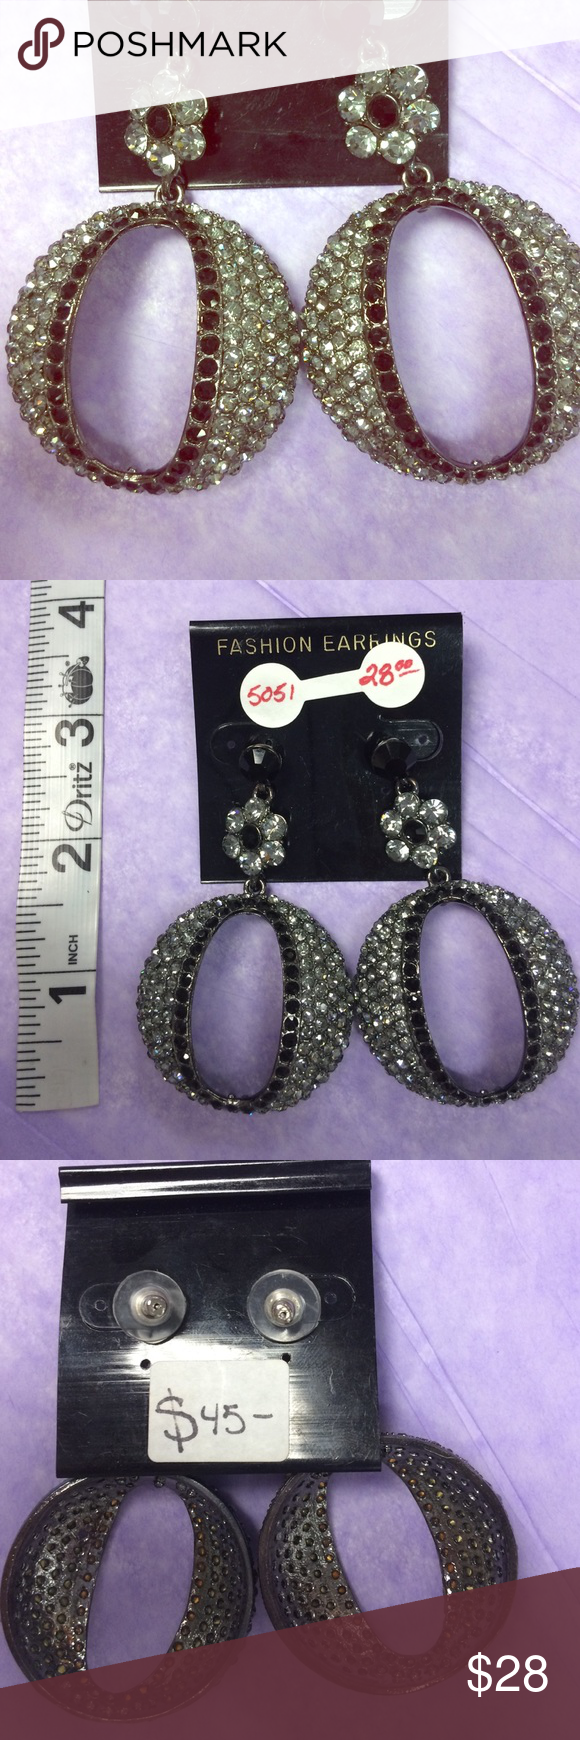 Earrings New, never worn rhinestone earrings.  Orig retail was $45 (tag is on back of card). Jewelry Earrings